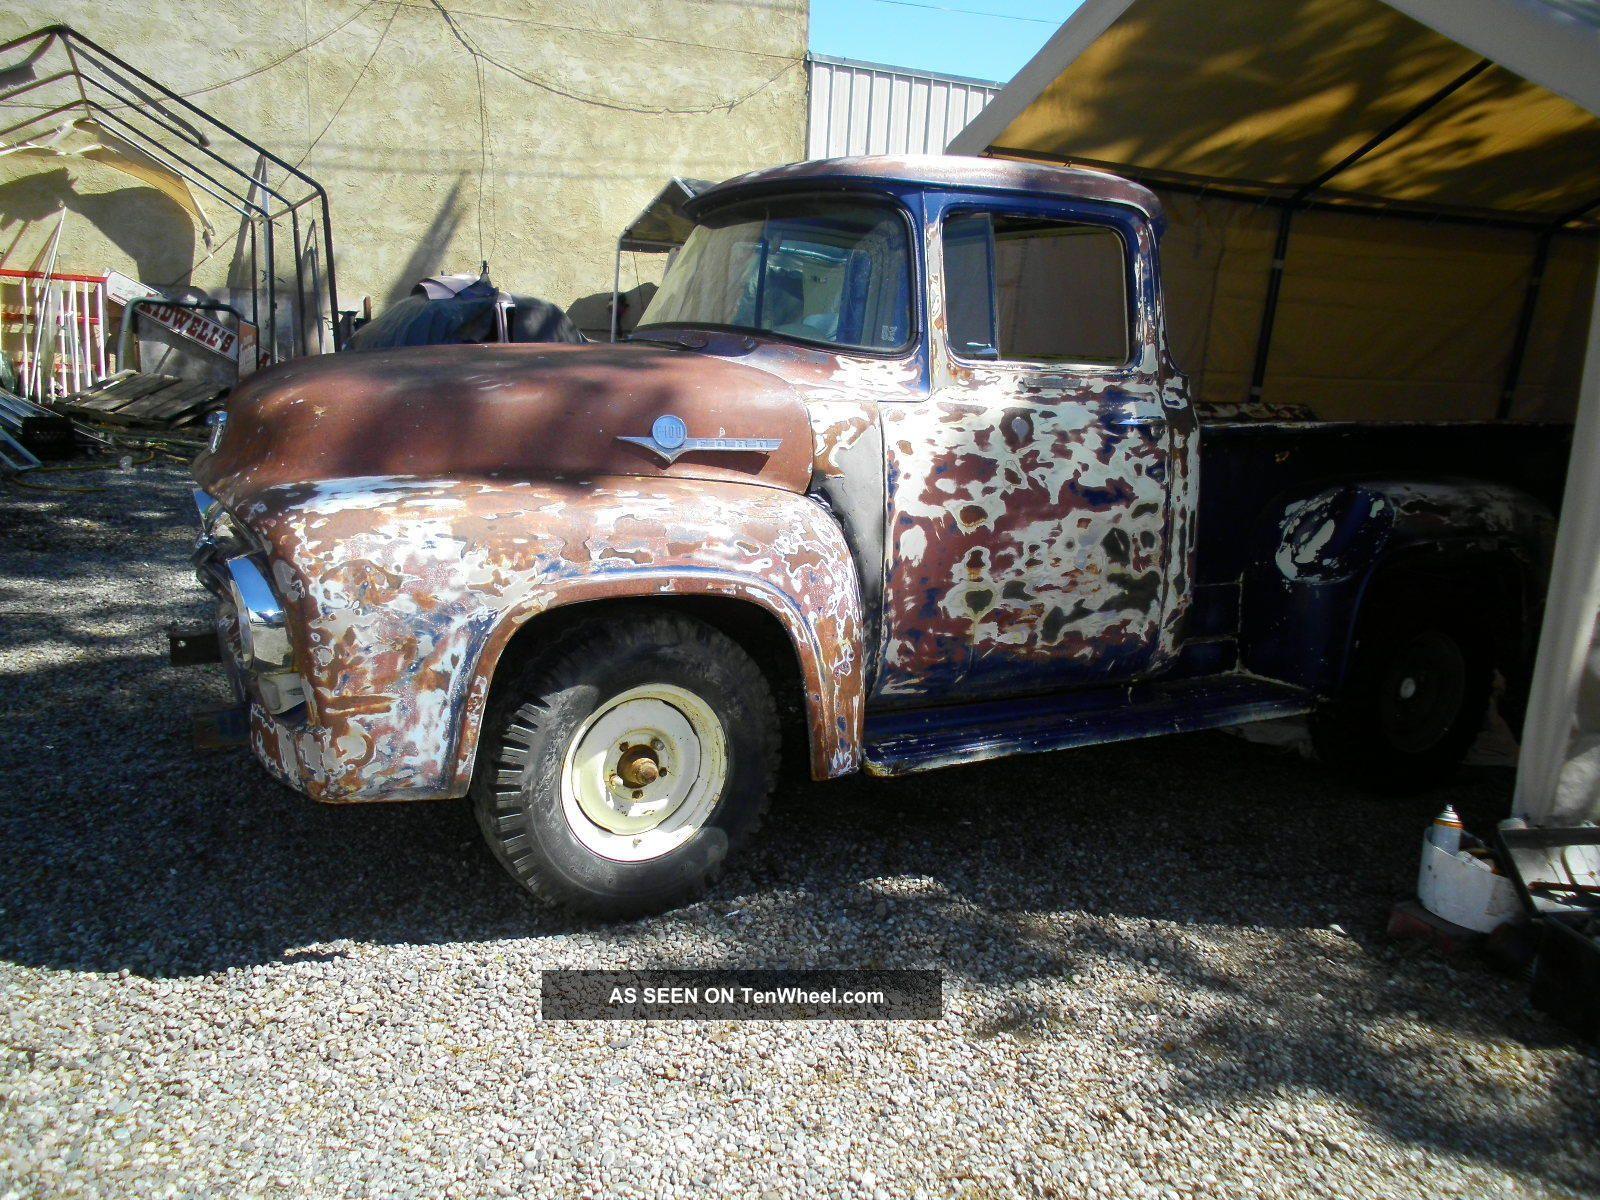 1956 Ford F100 Big Window Pickup Truck California Hot Rod Rat Rod Pro Street Other Pickups photo